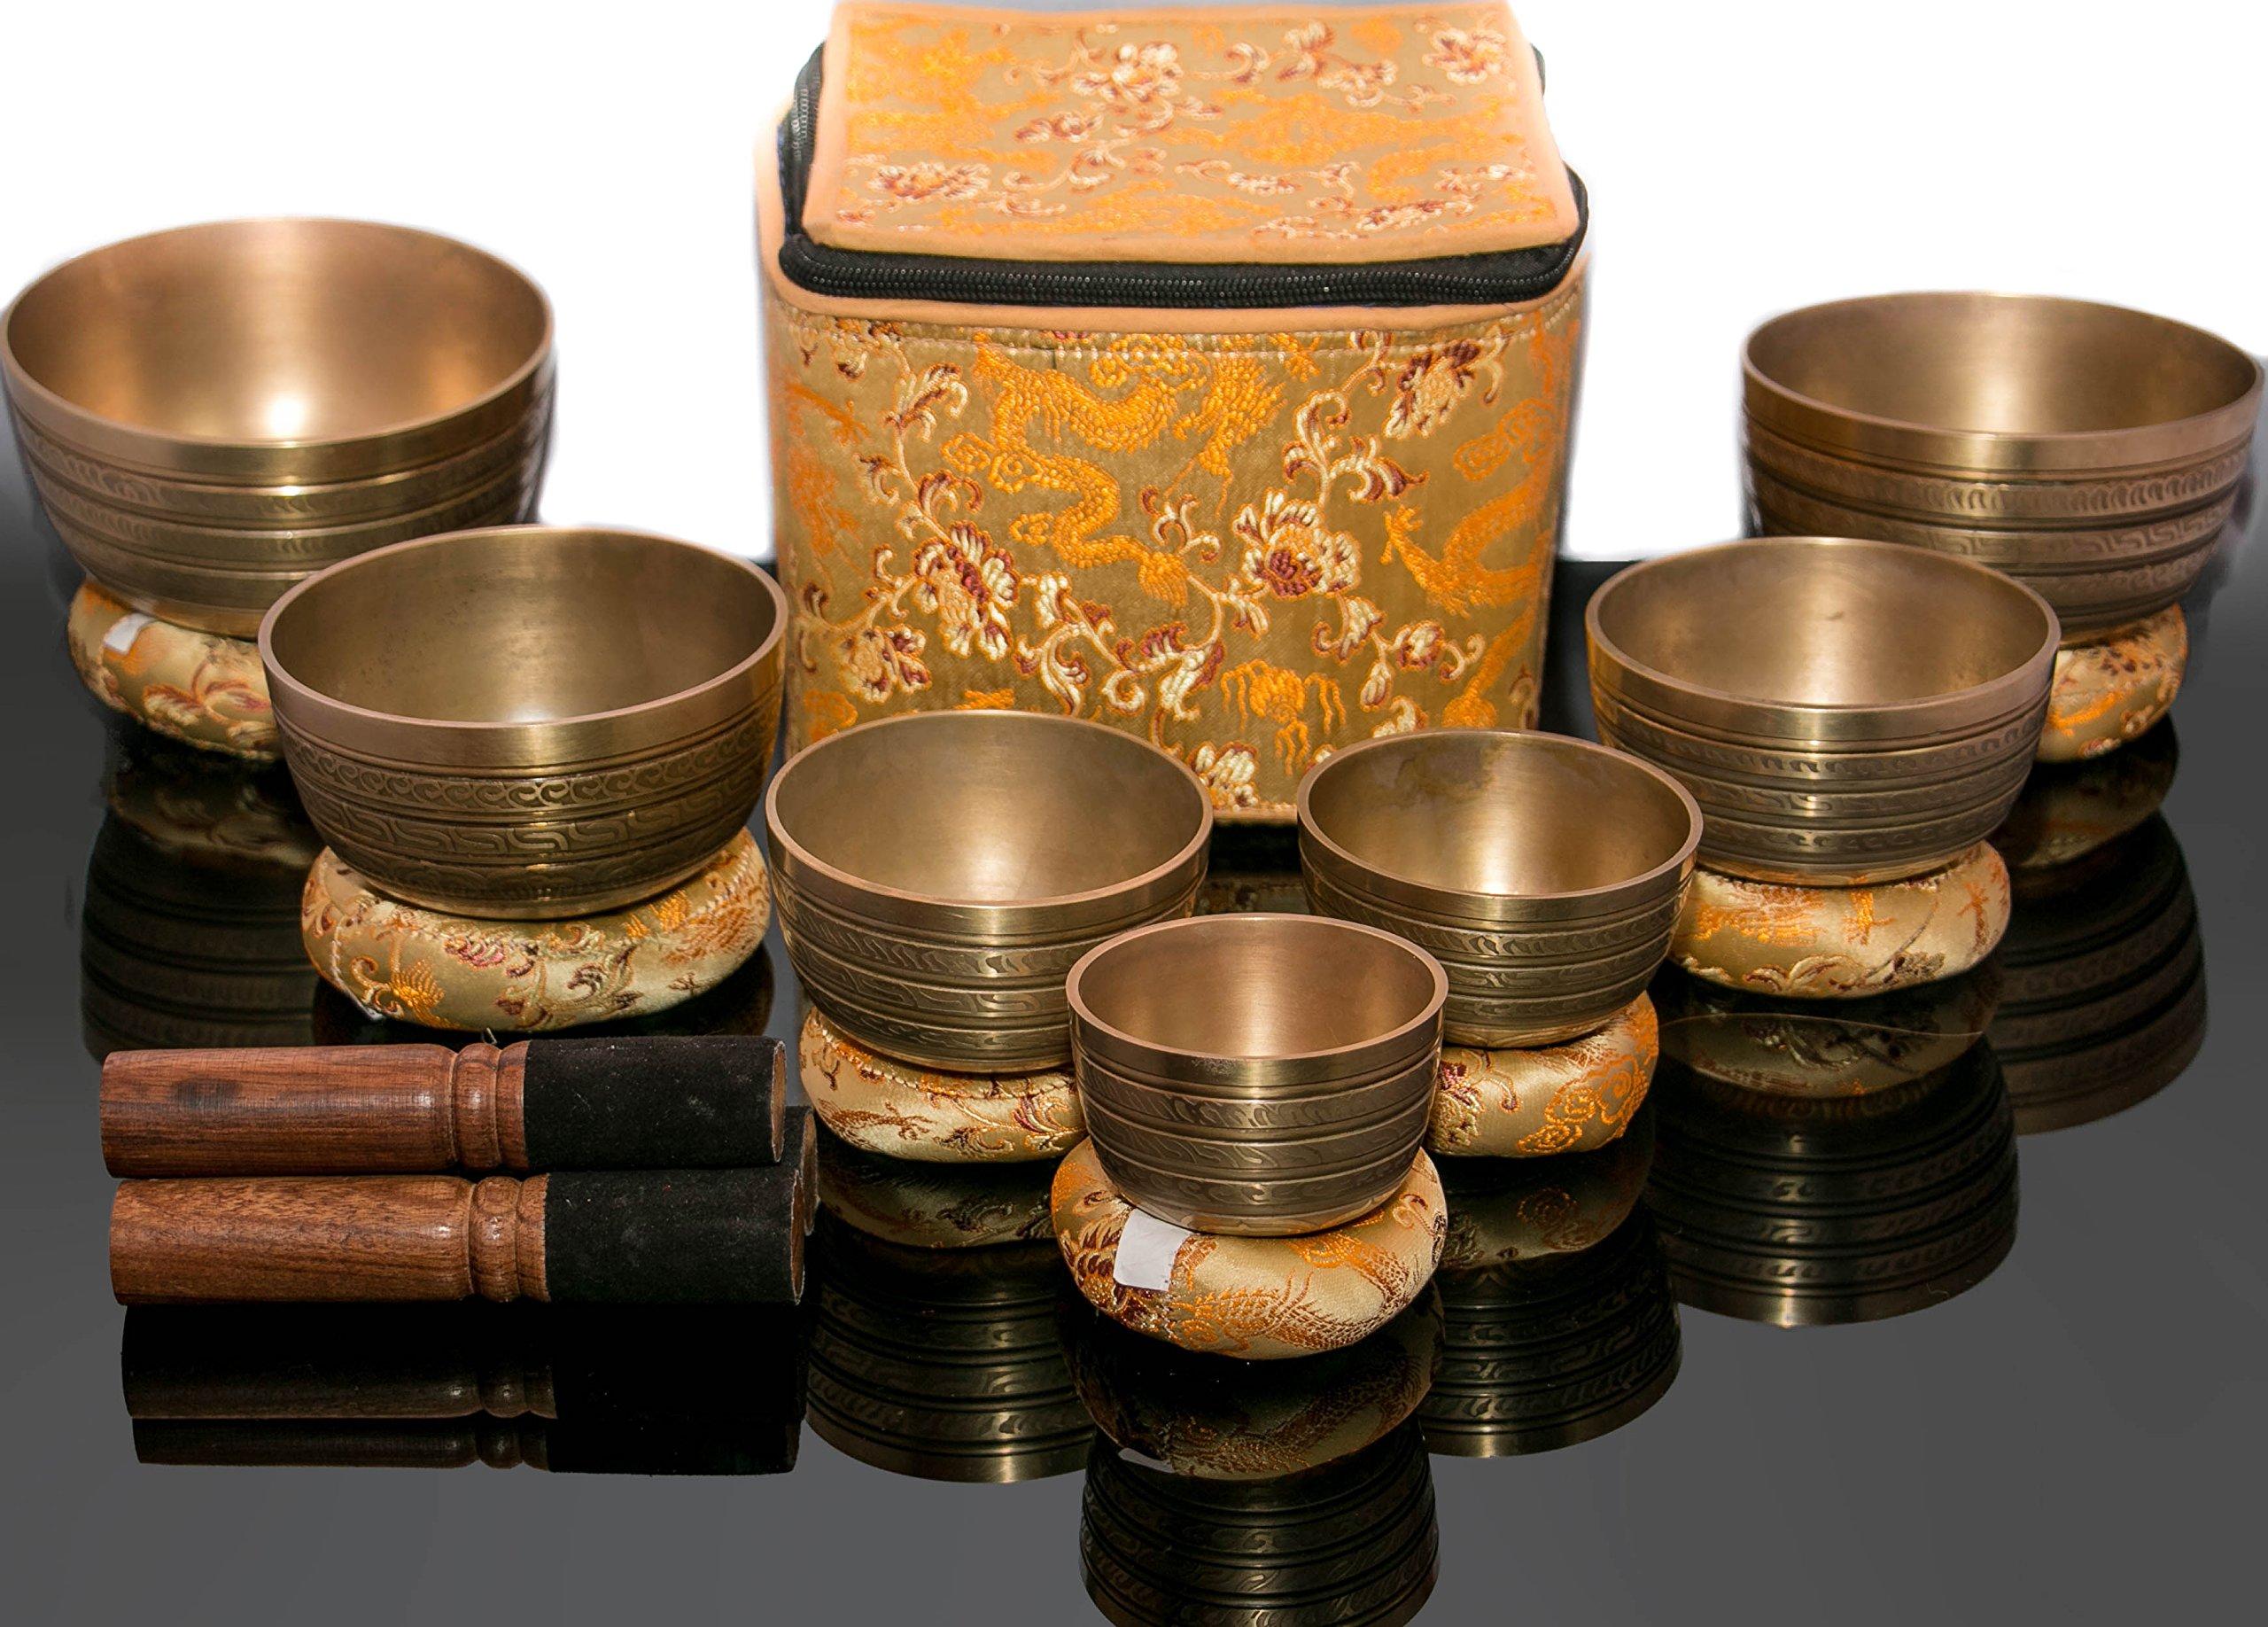 Chakra Healing Tibetan Hammered Himalayan Singing Bowl Set of 7 Meditation Bowls Hand Bowls from Nepal by Gifts From Nepal